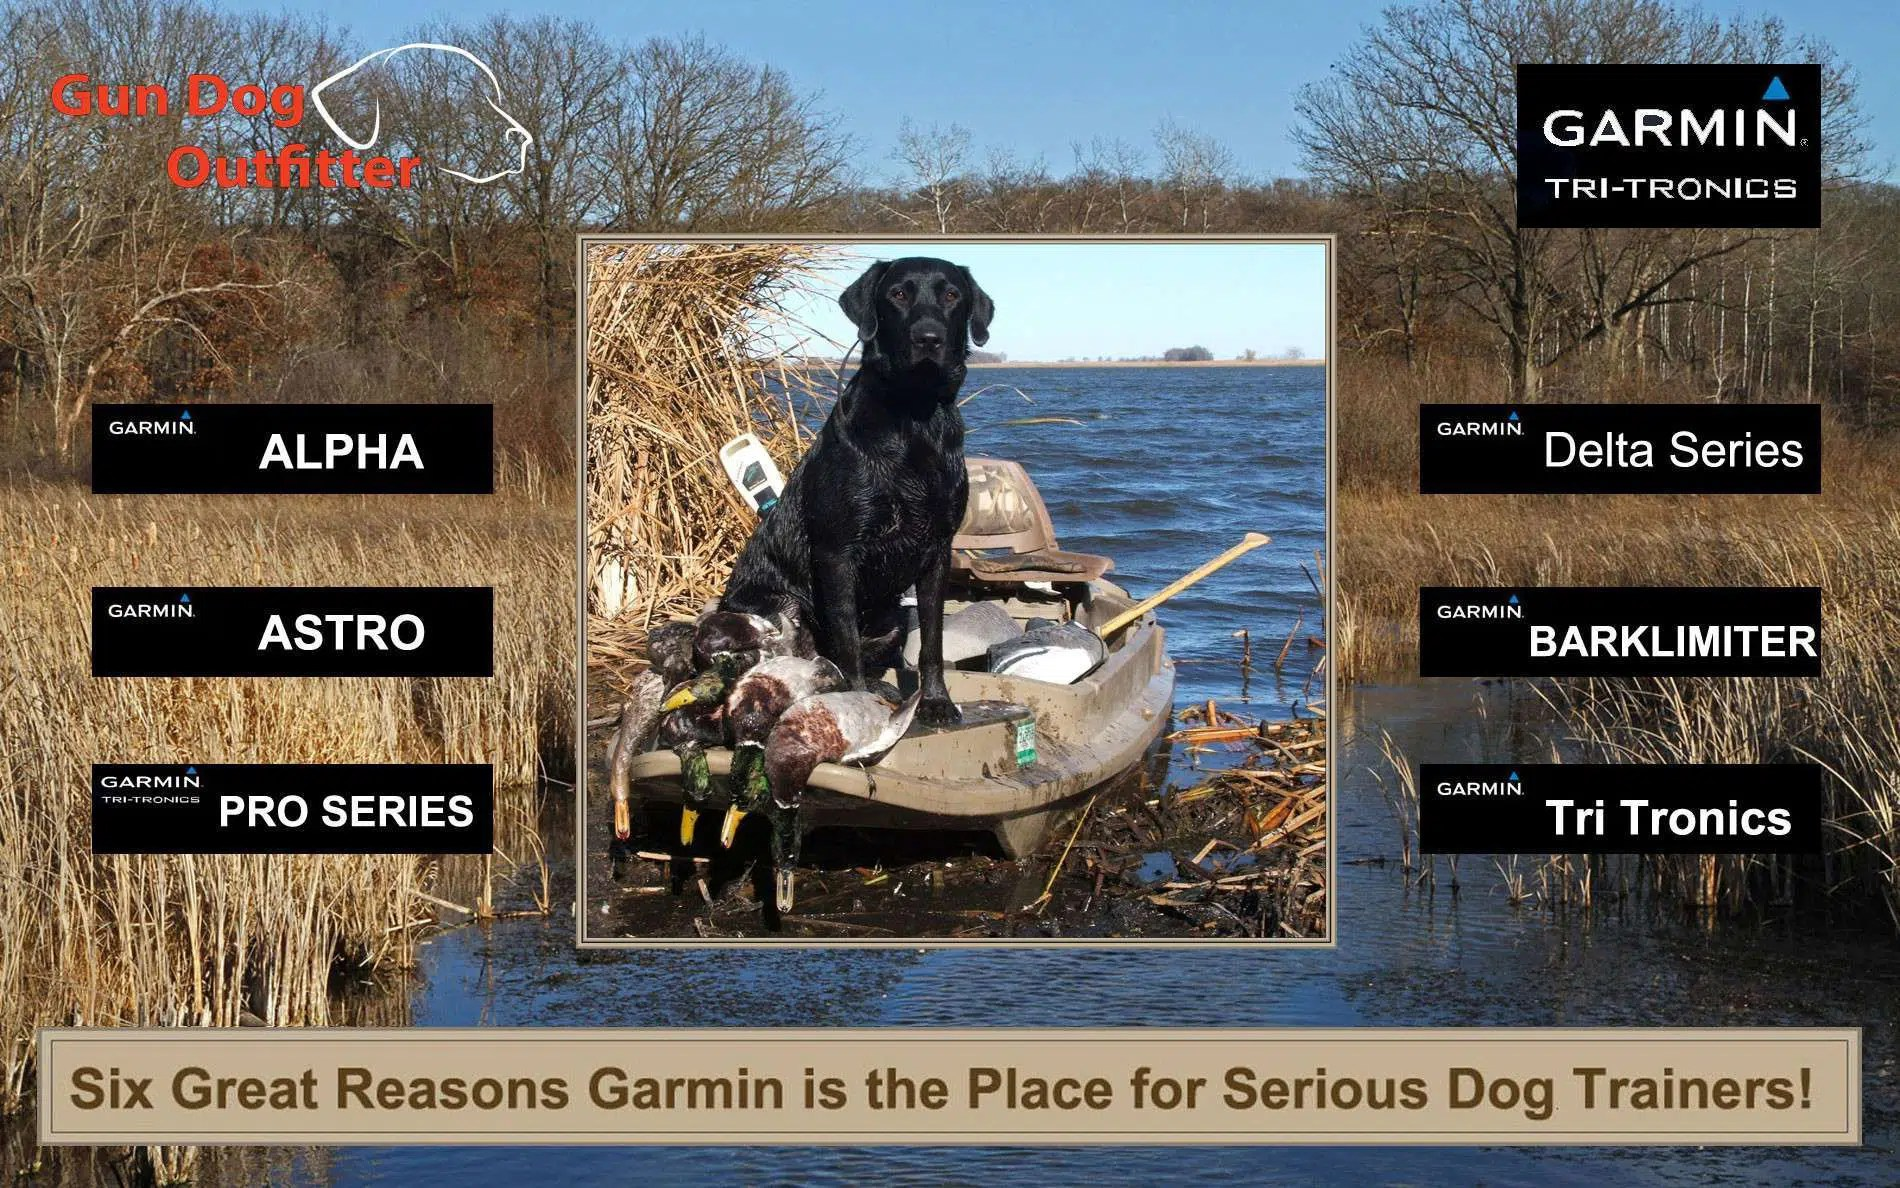 Build a better dog with Garmin Tri Tronics